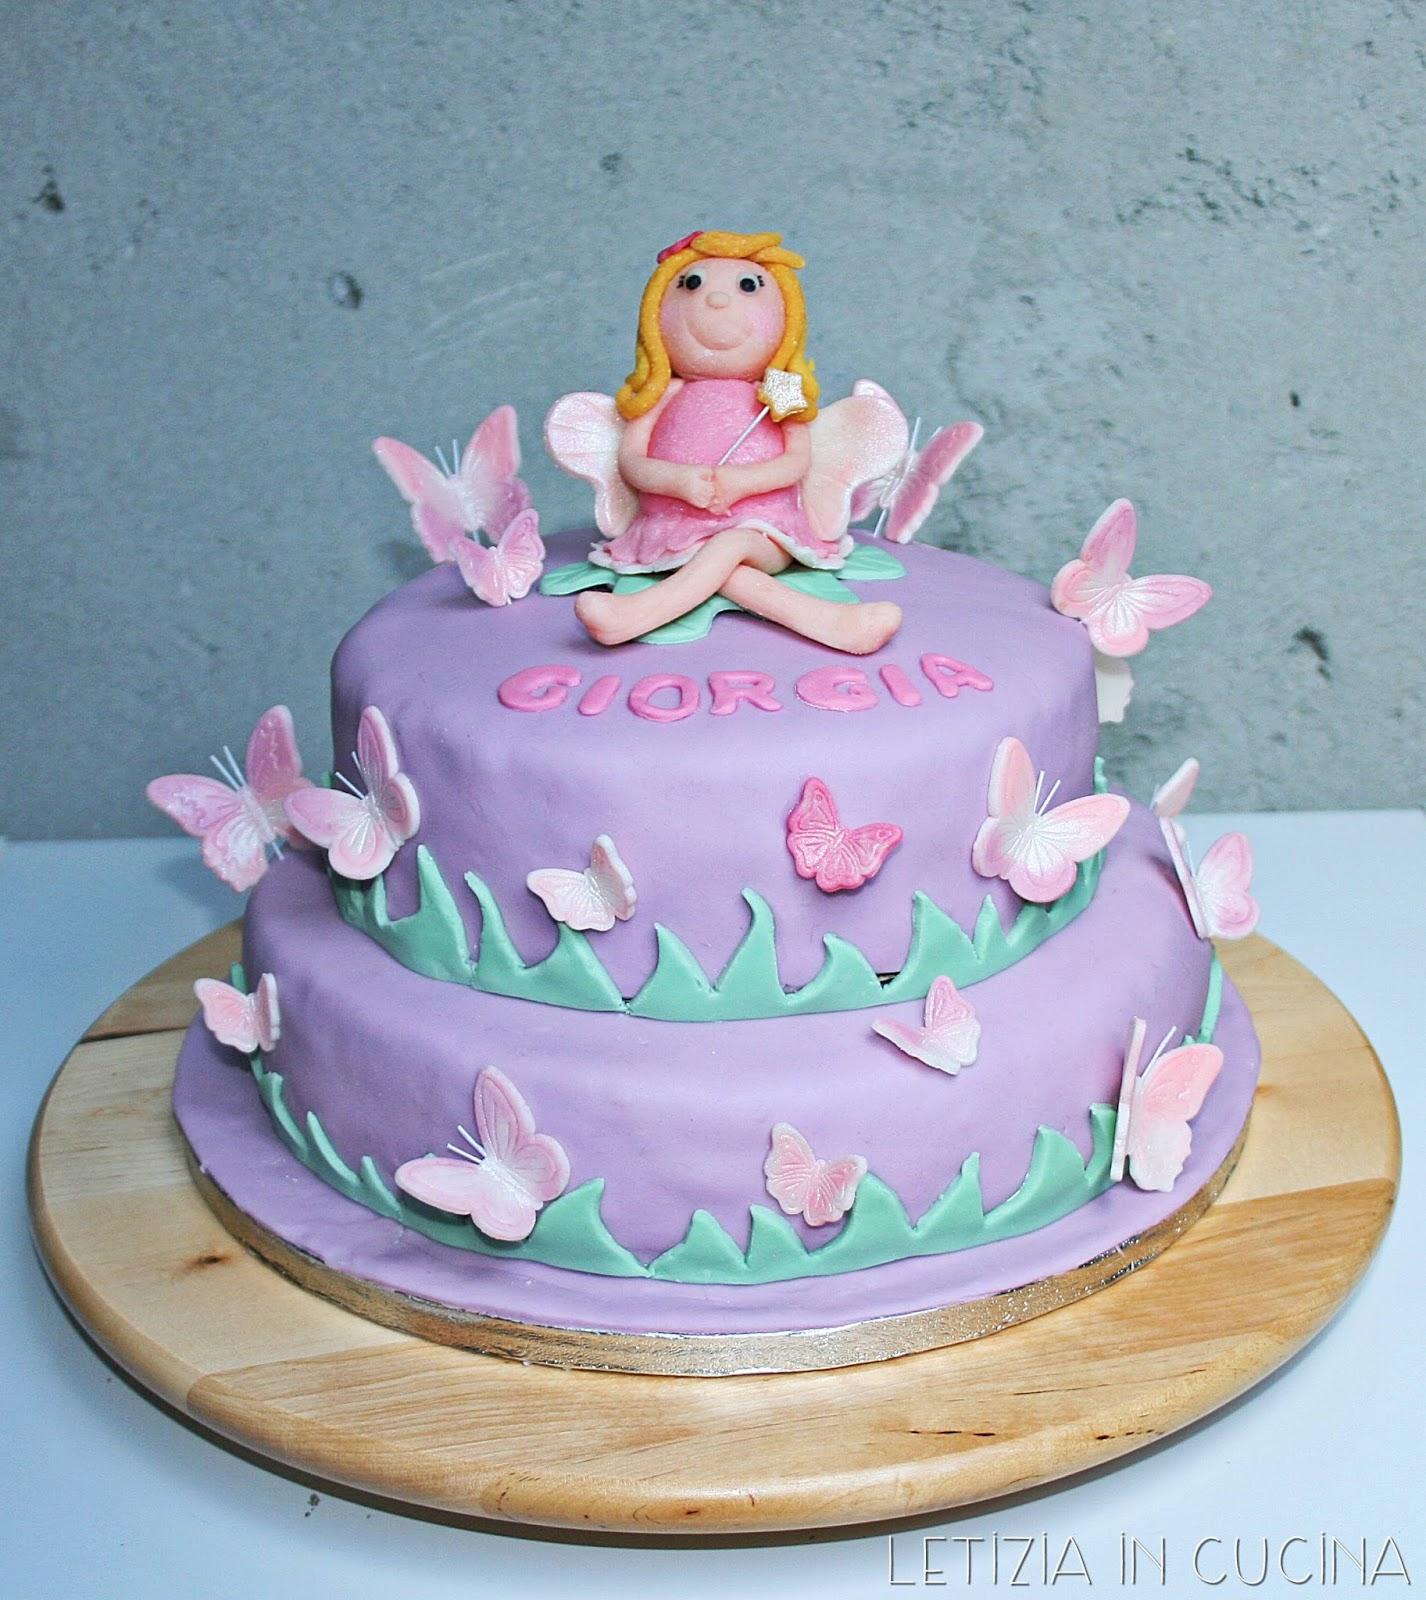 Letizia in Cucina: Torta Fatina e Farfalle